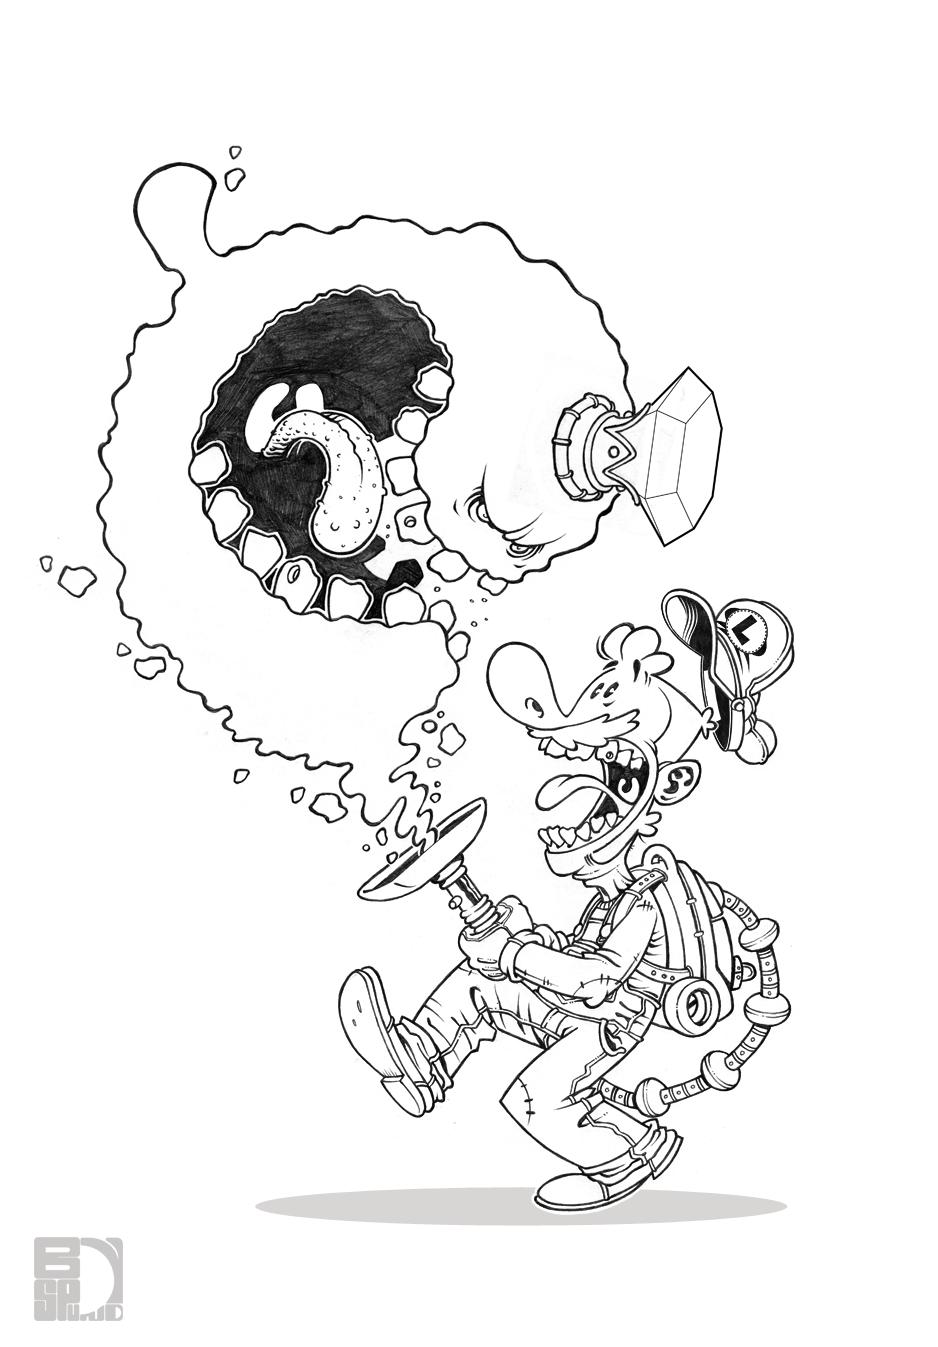 Luigis mansion by spundman on deviantart for Luigi s mansion coloring pages